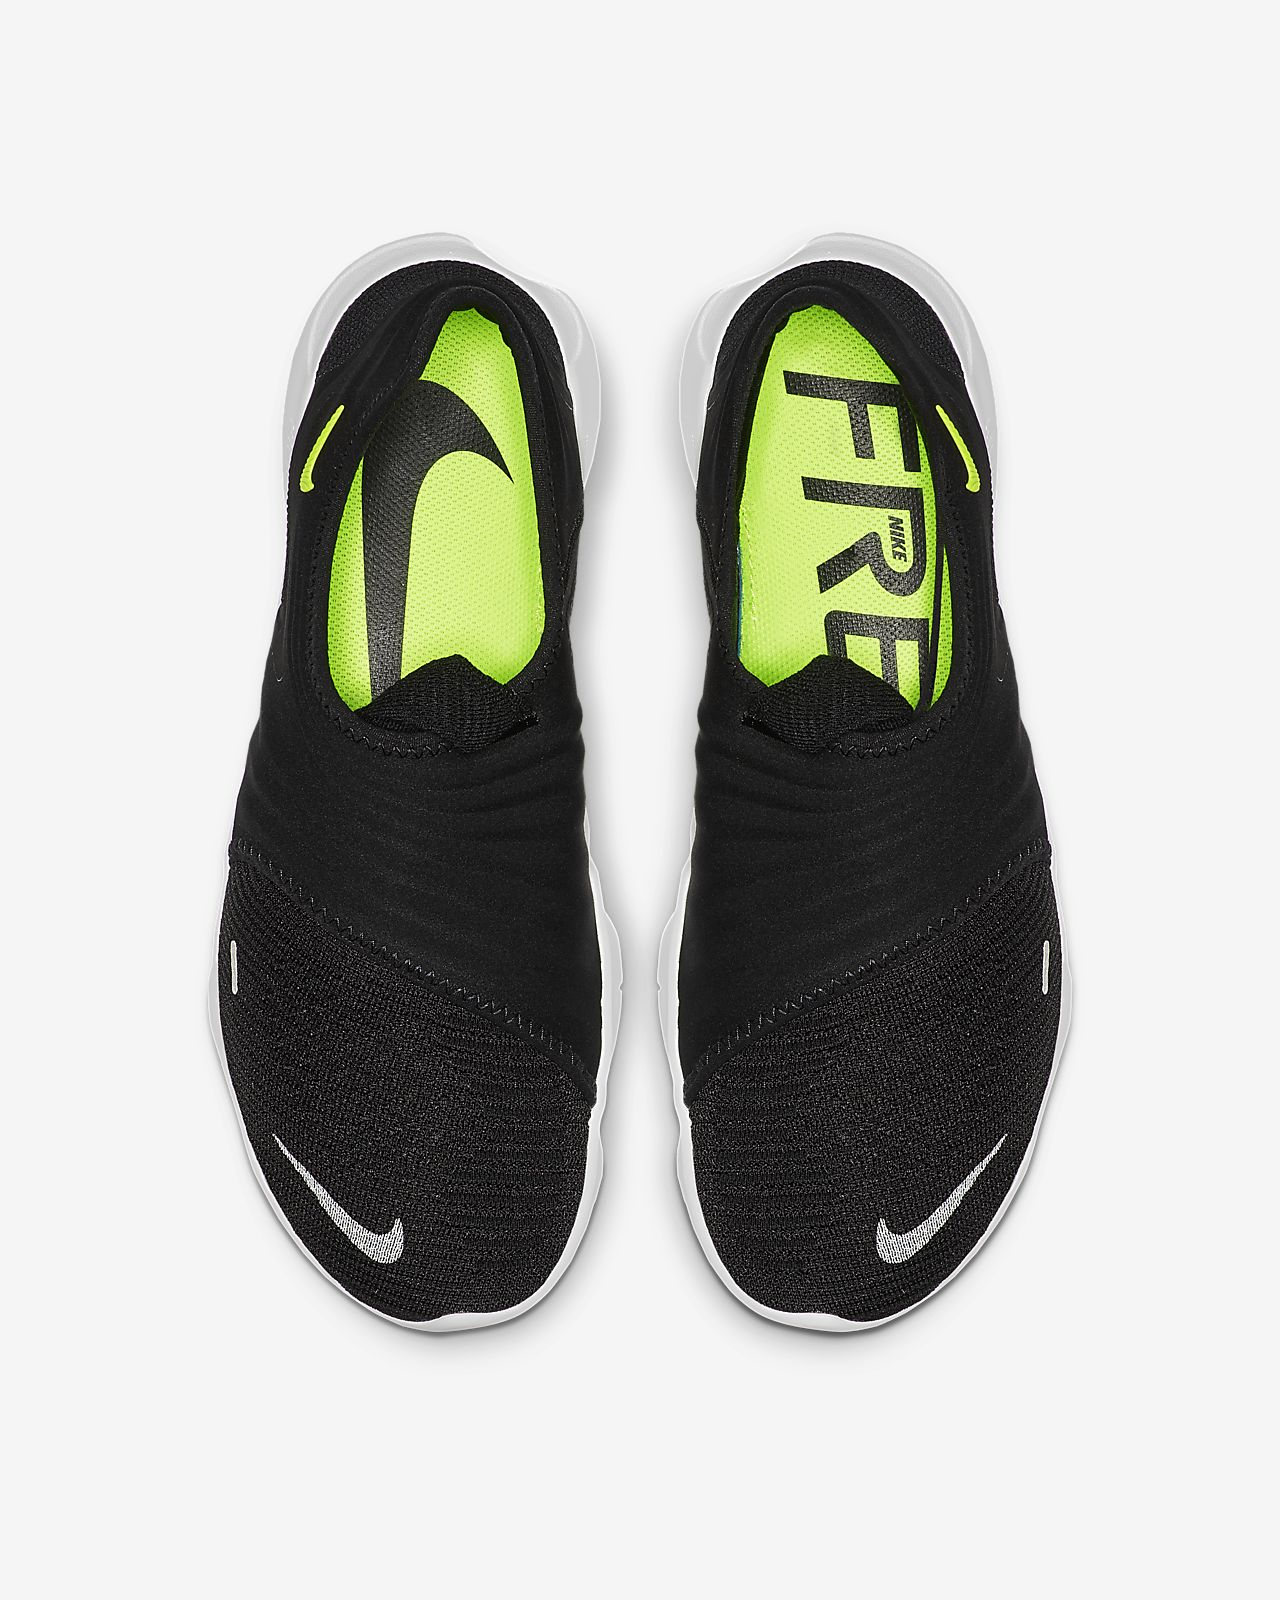 Nike Free 4.0 V3 Rabatt kaufen 2019 Schuhe Size:(herren